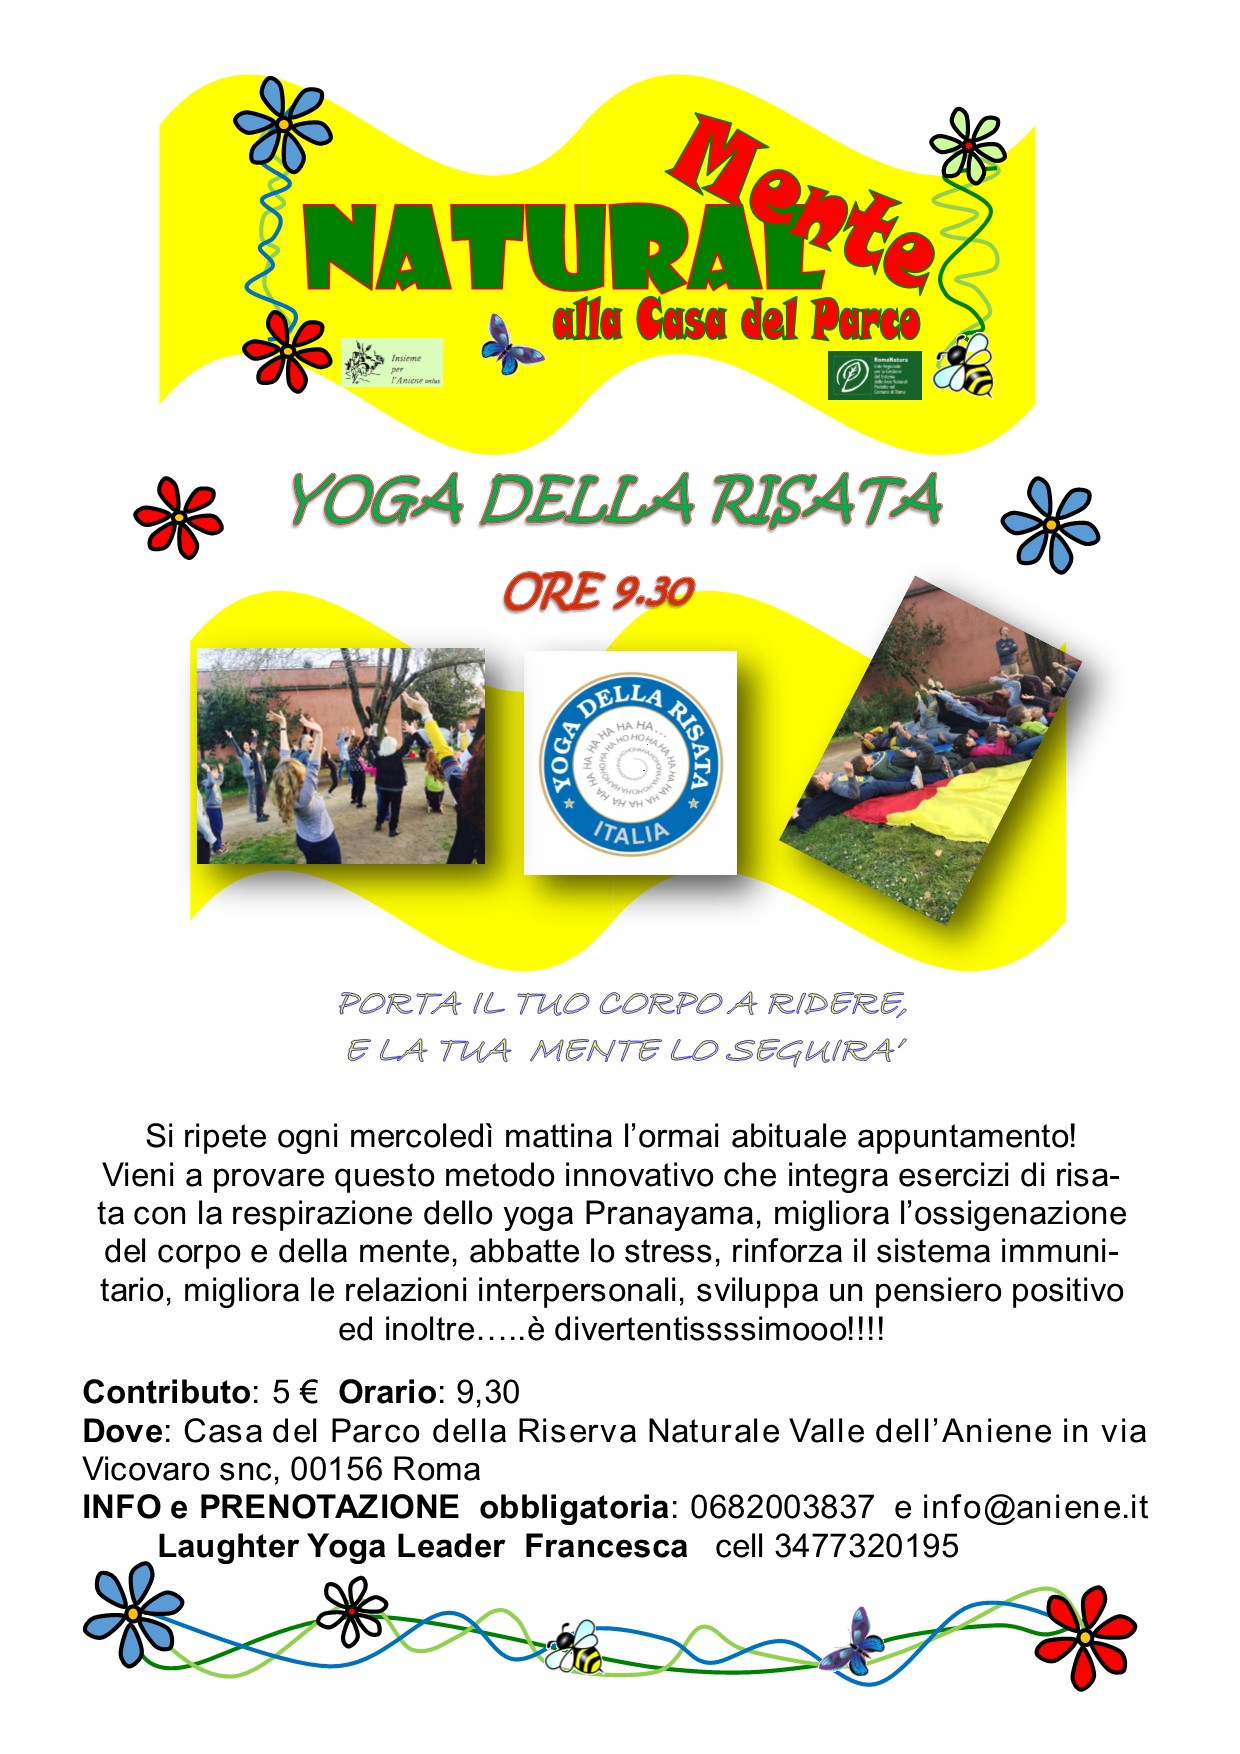 Yoga della Risata - mercoledì 15 aprile